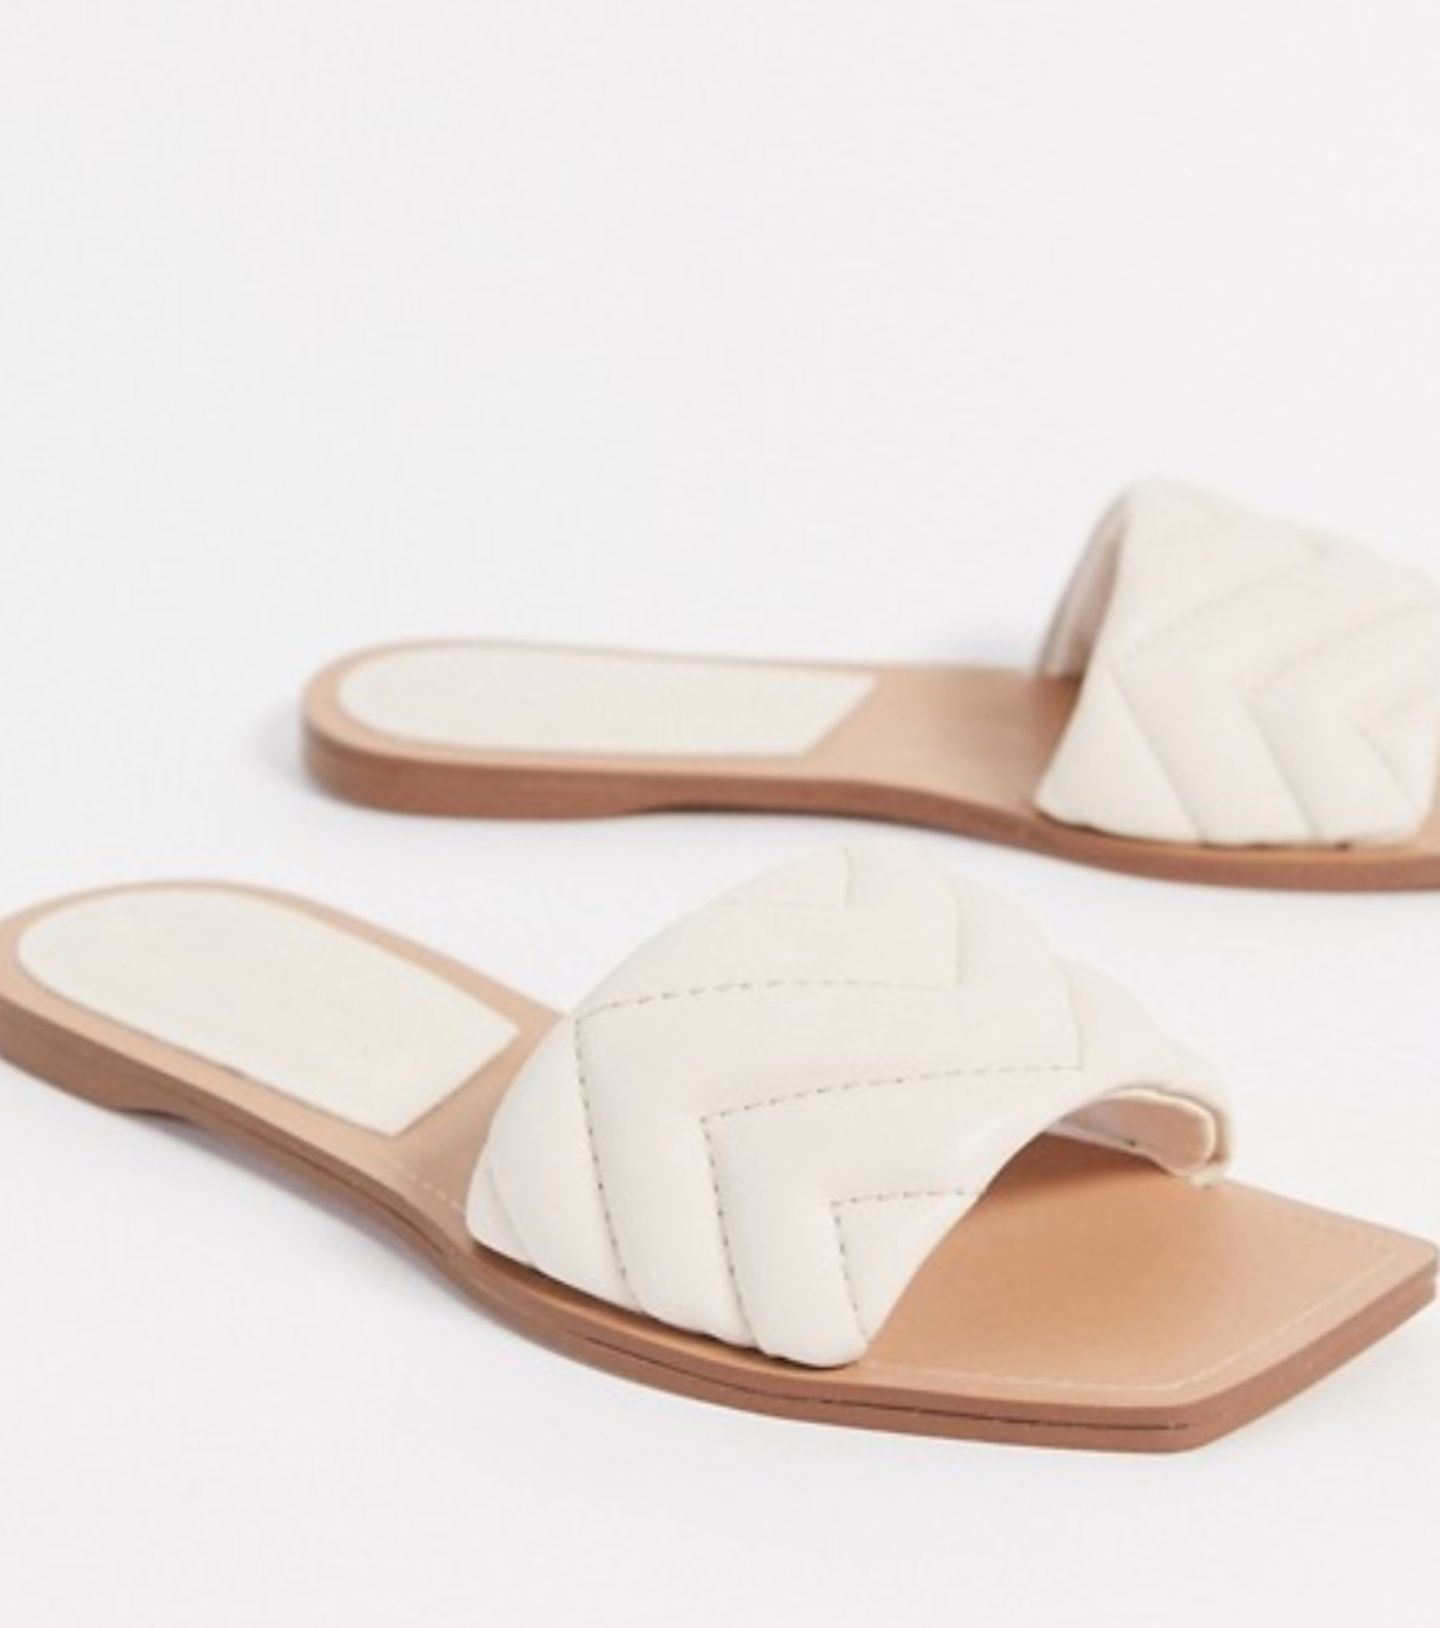 Sommerschuhe: Seppoptik Mules